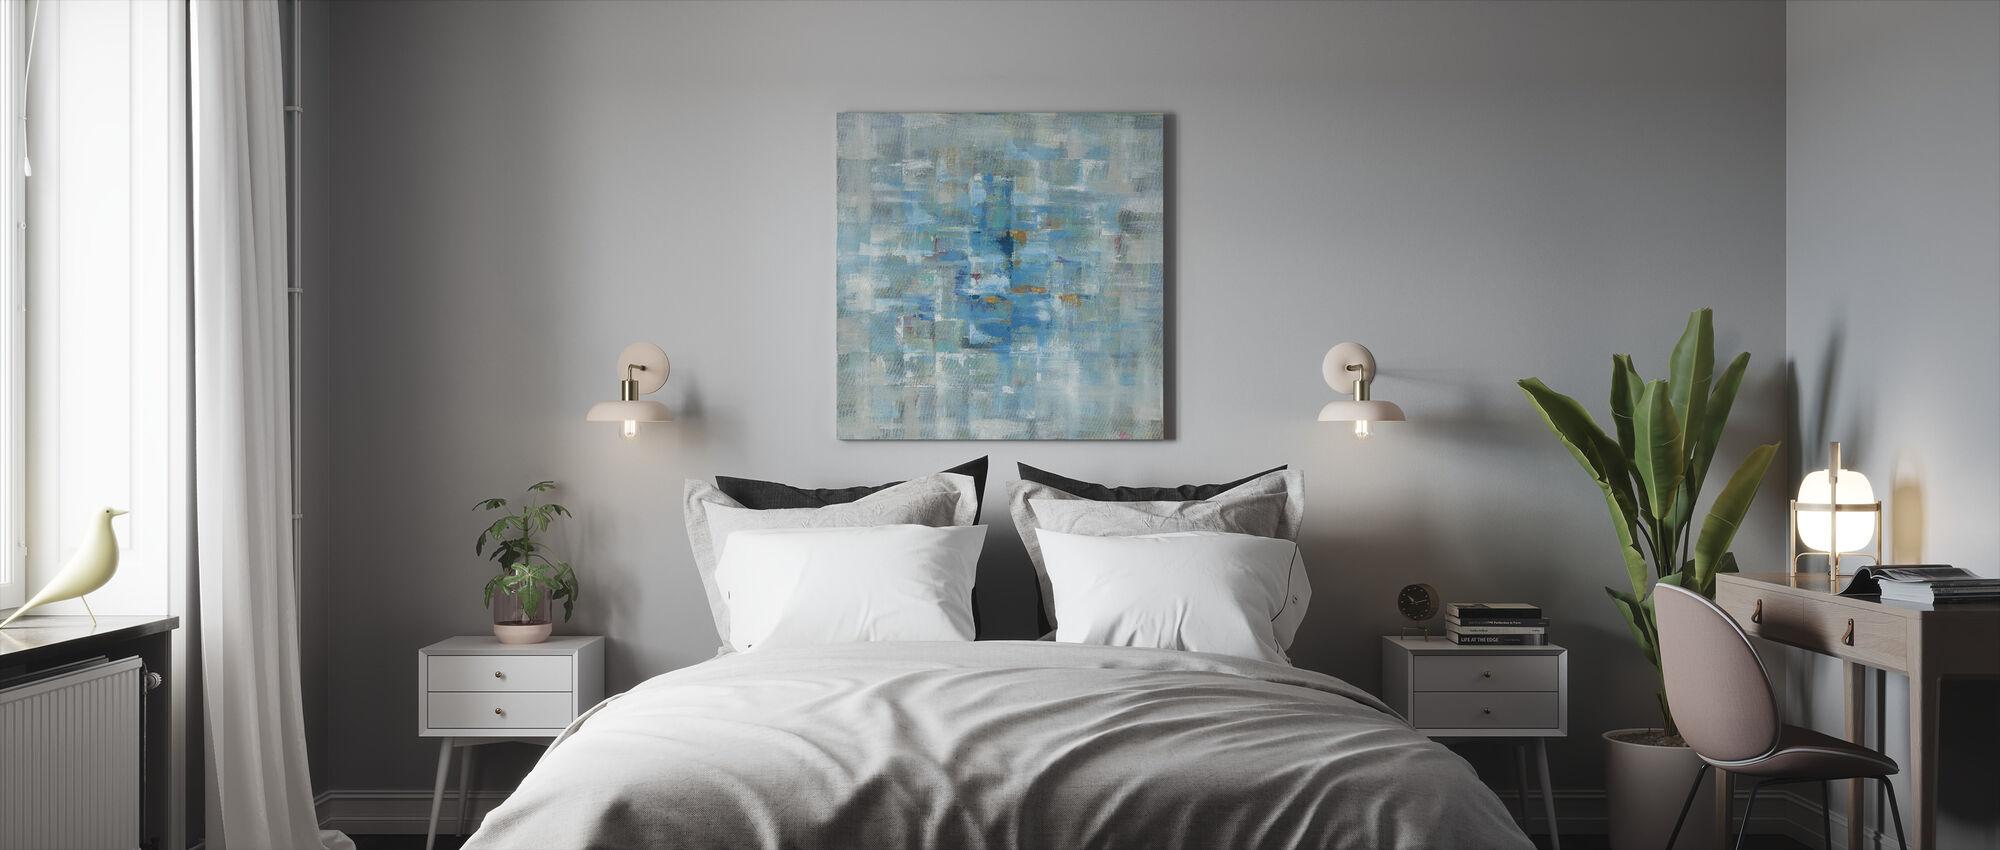 Abstracte vierkanten - Canvas print - Slaapkamer